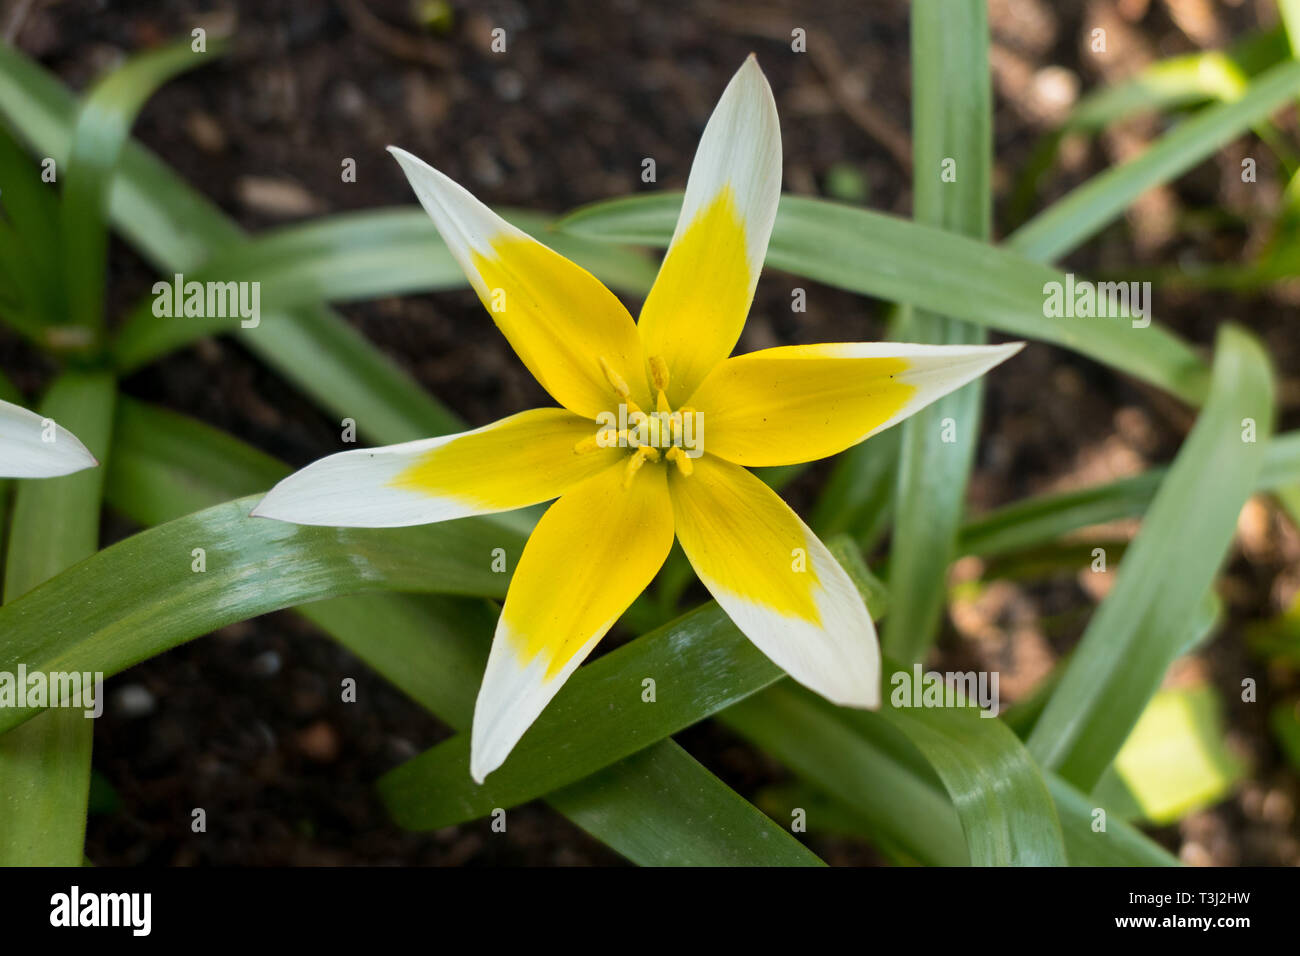 Flower of a hydrangea paniculata aka Pinky-Winky - Stock Image